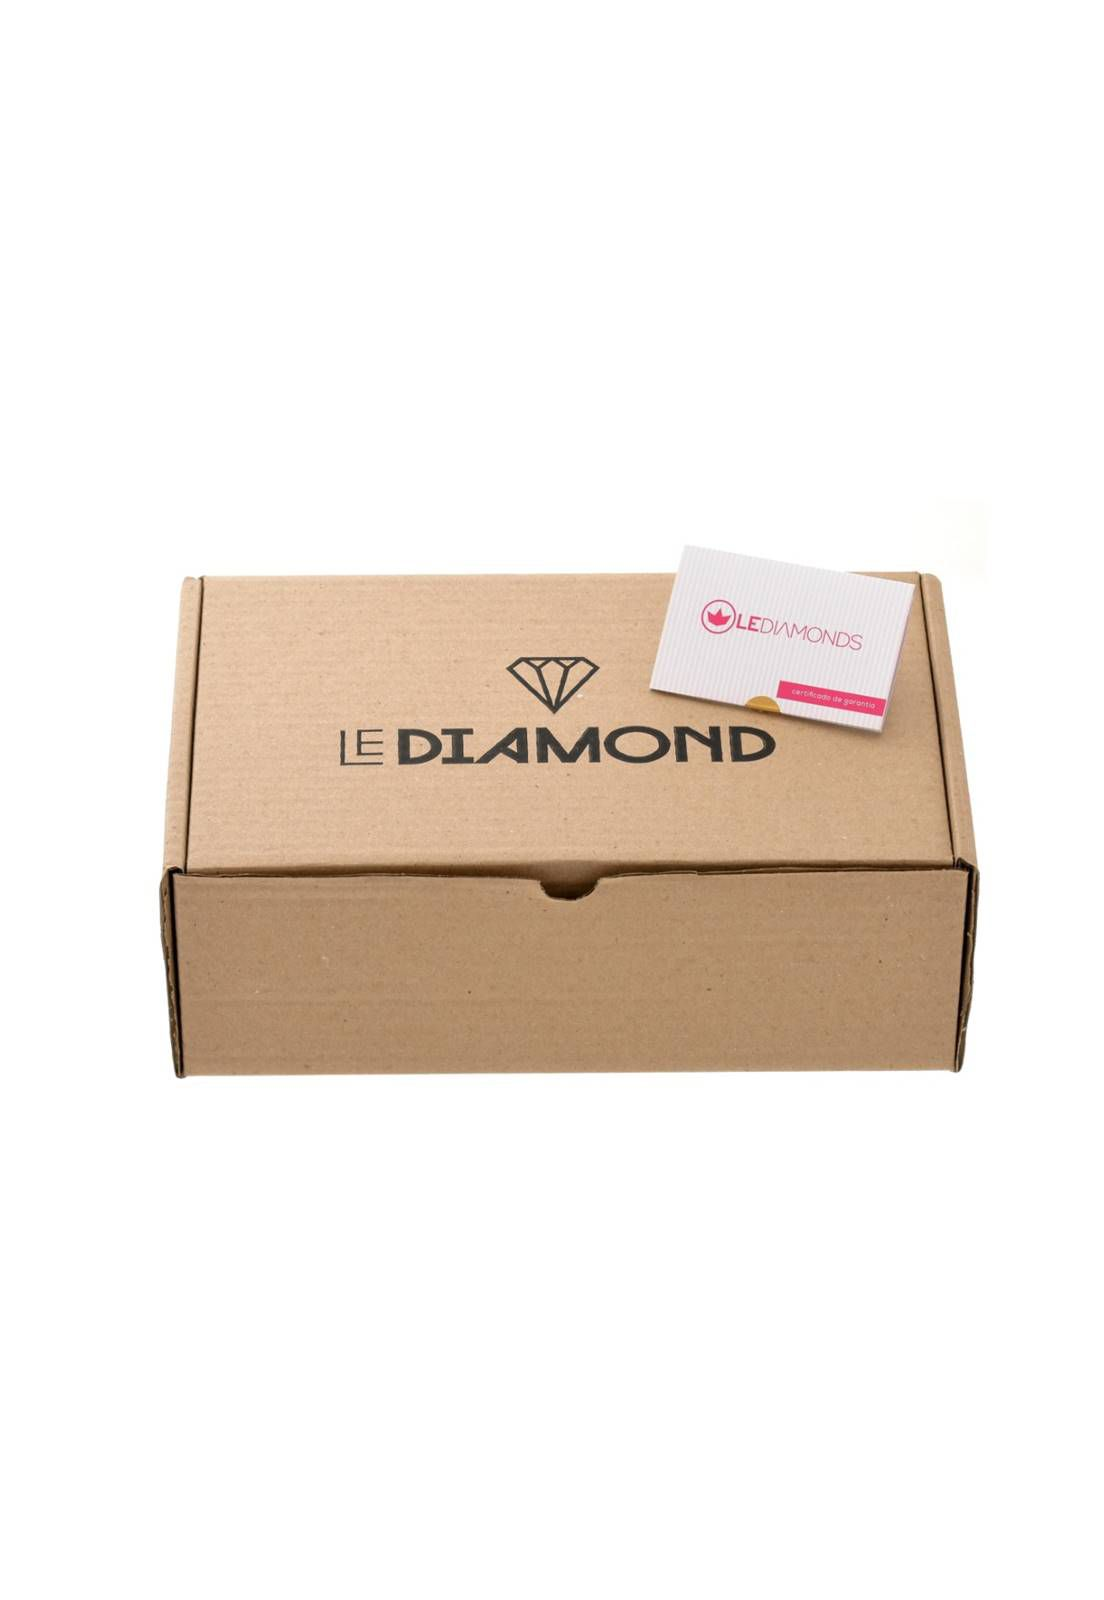 Brinco Le Diamond Geométrico Prata e Dourado